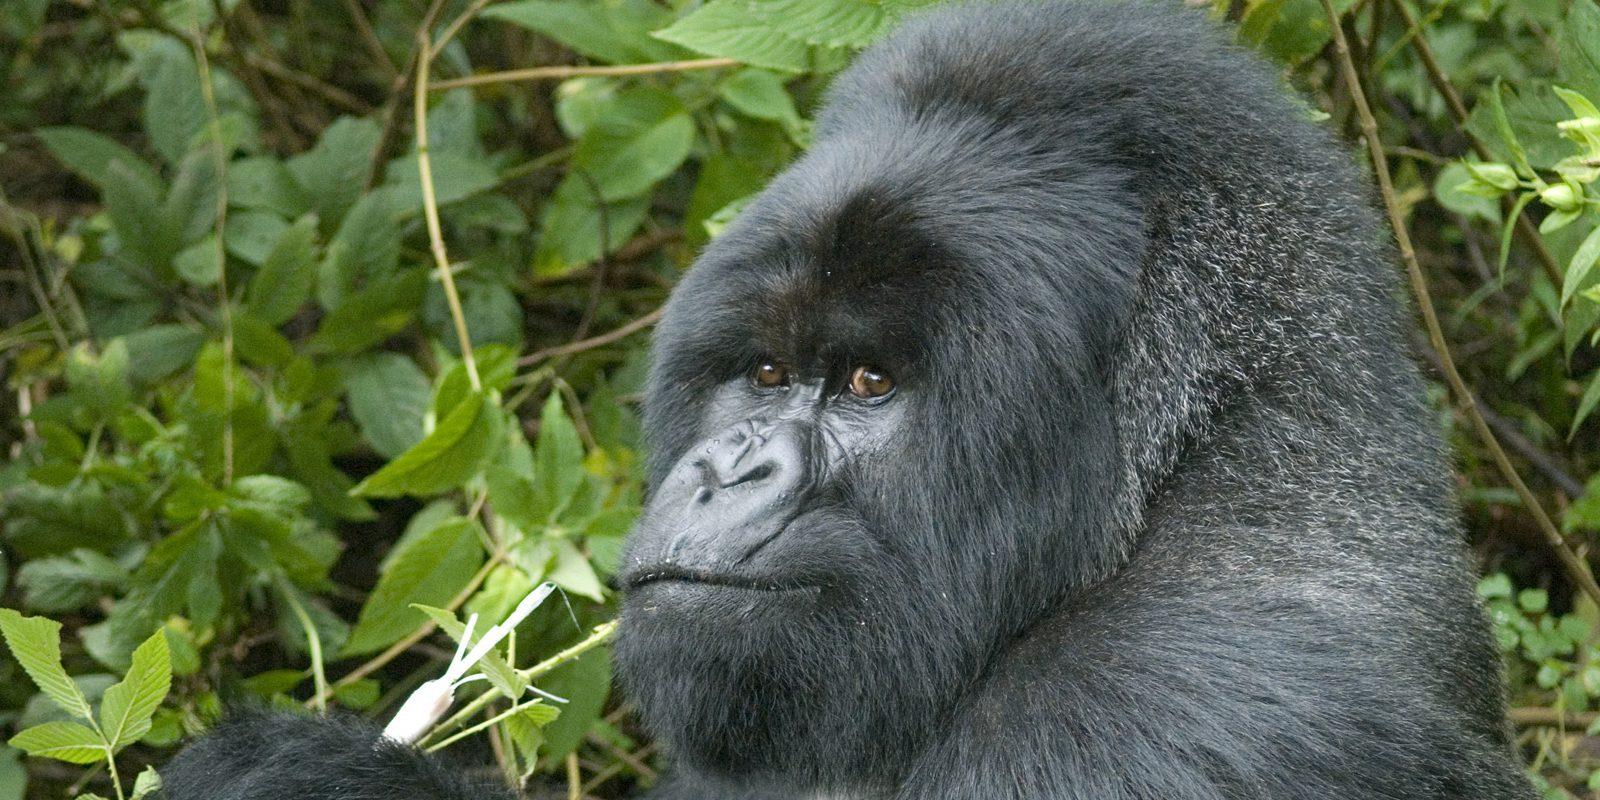 gorilla looking over shoulder at the camera